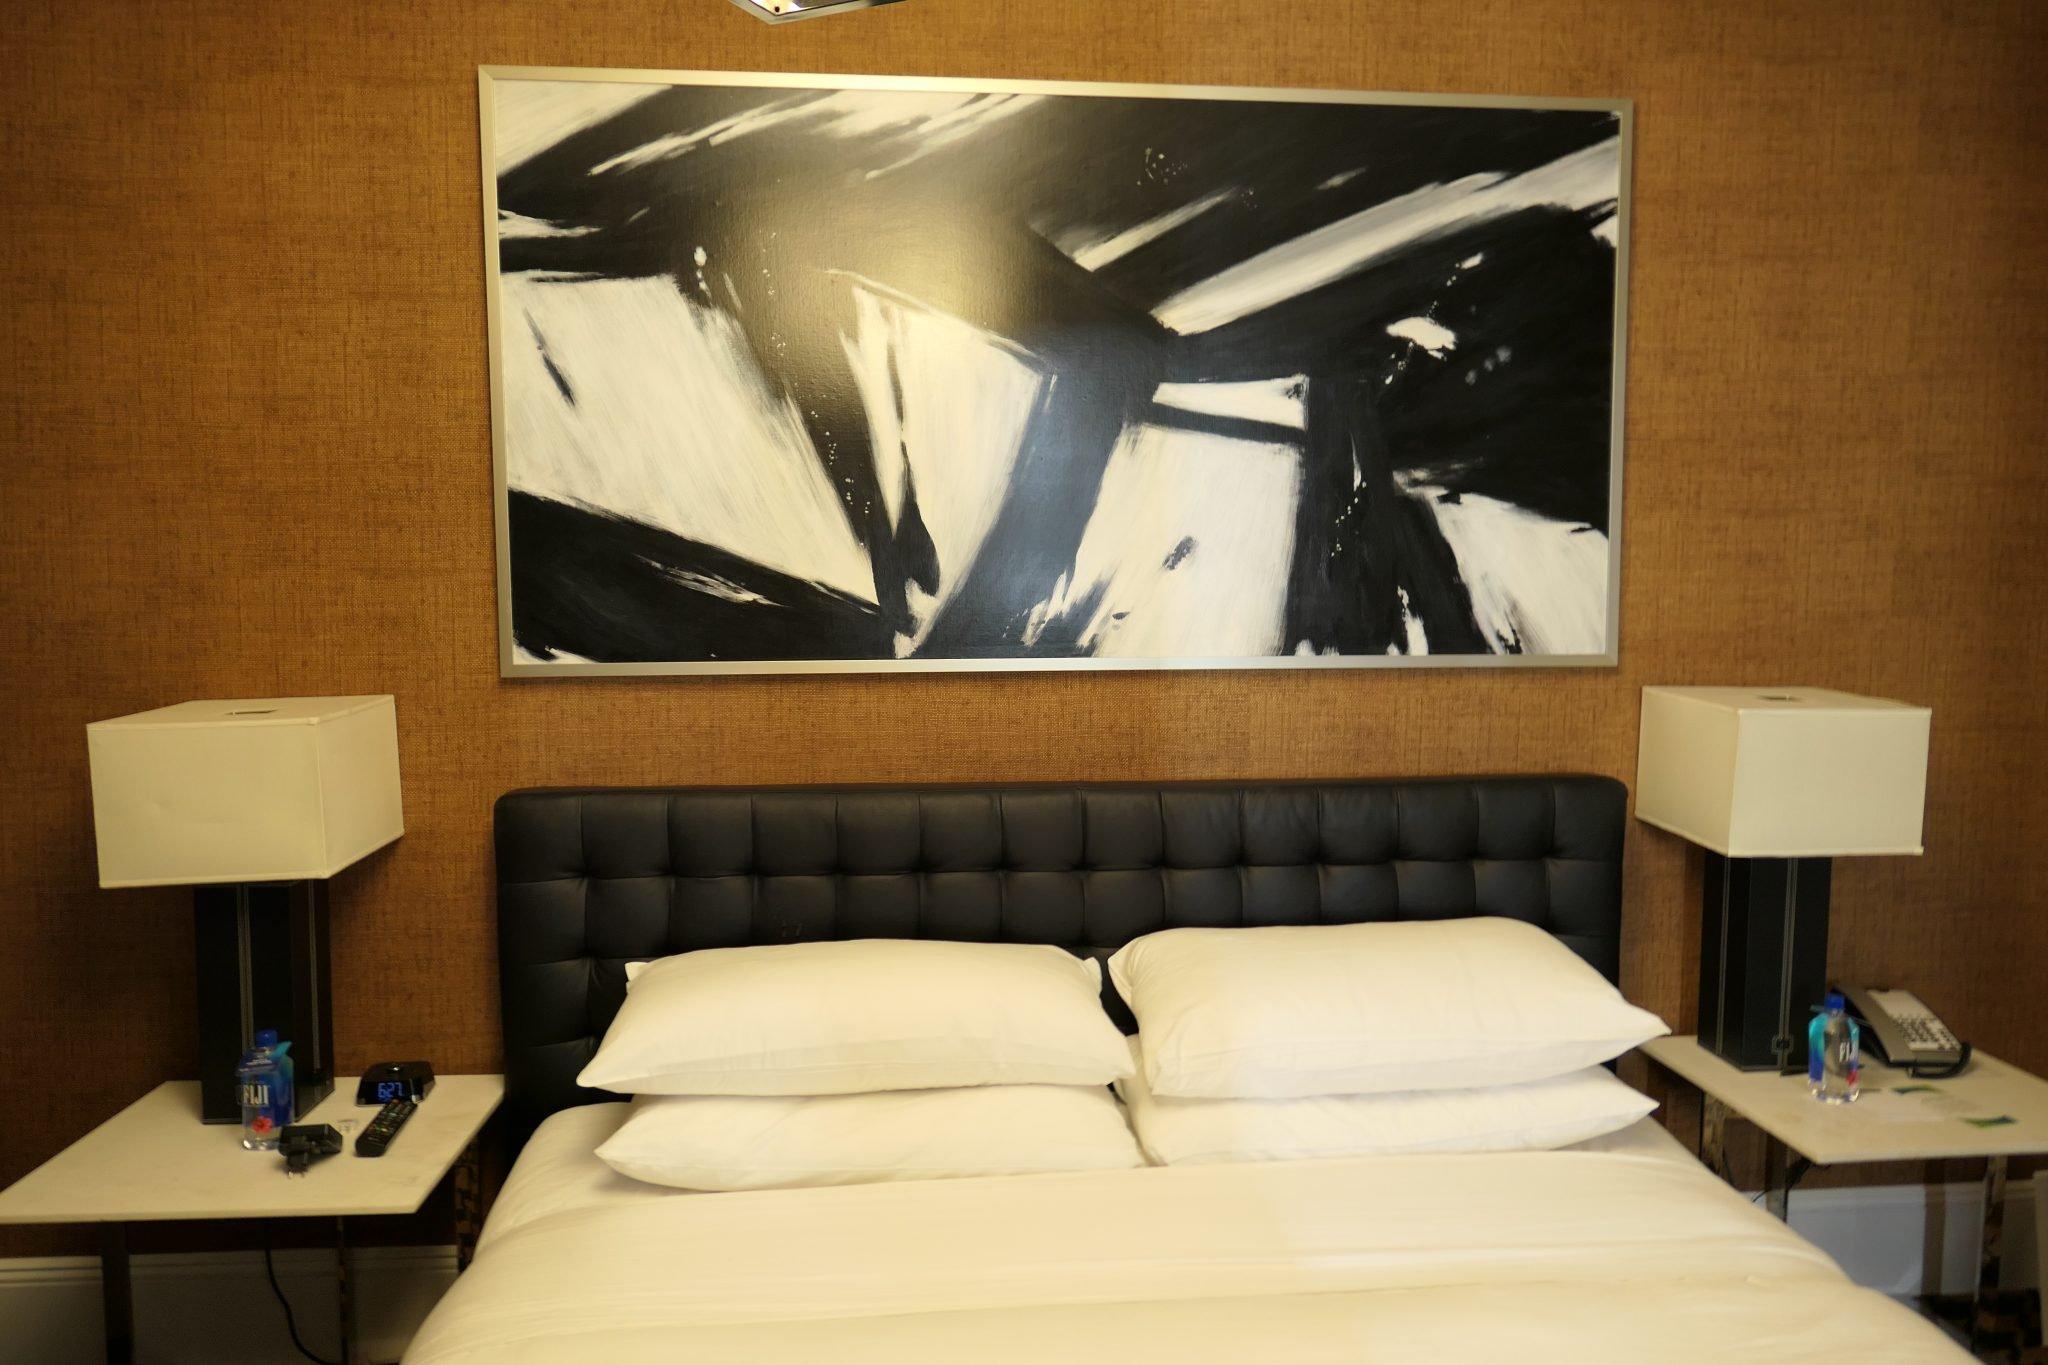 Hotel Ameritania in New York review